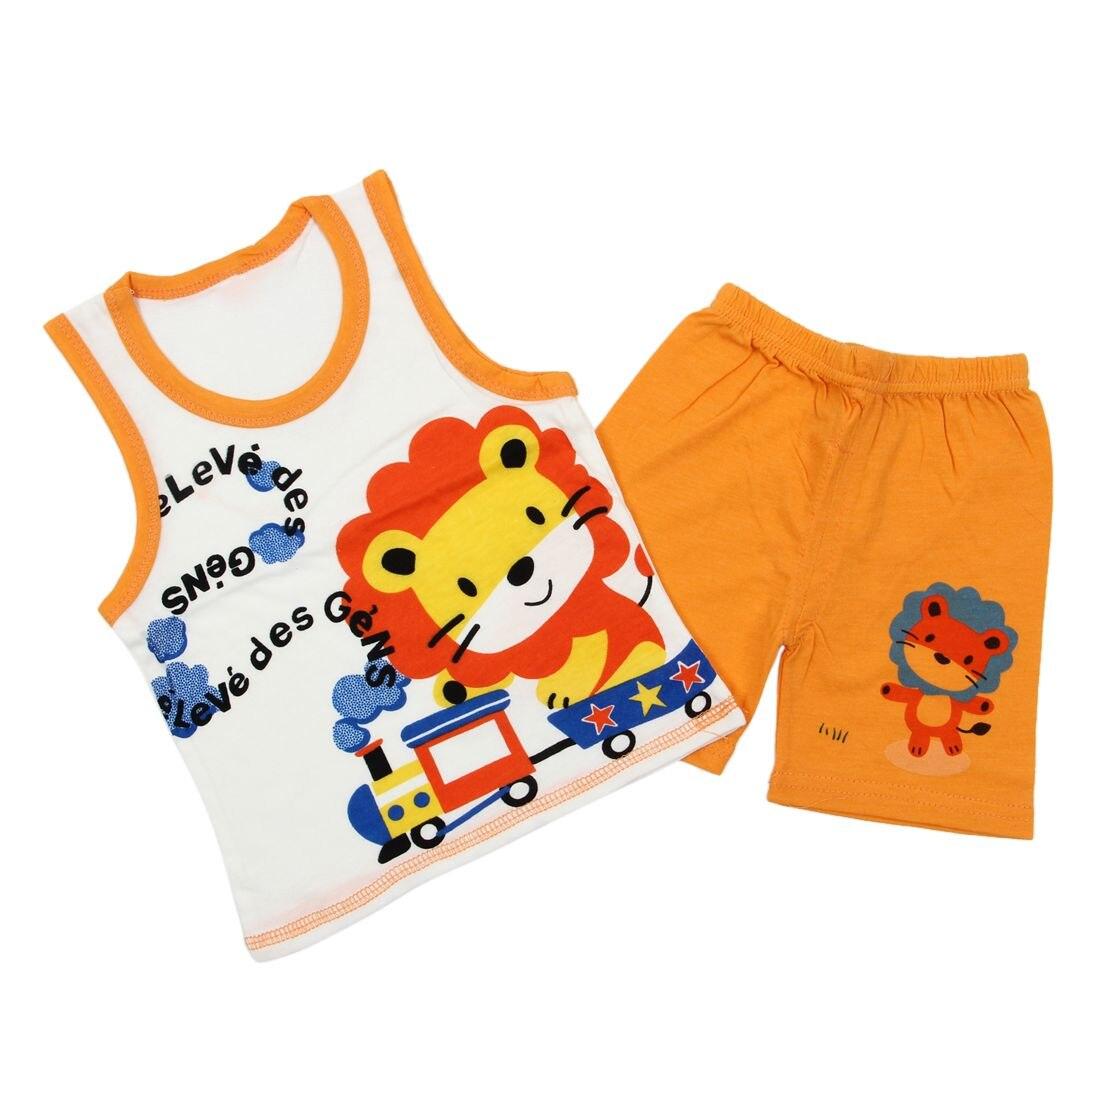 HOT SALE Baby Kids Clothes Set,Girls Boys T shirt+Pants Undershirt Shorts,Kids Pajama Set,Children T Shirts New-Lion Orange